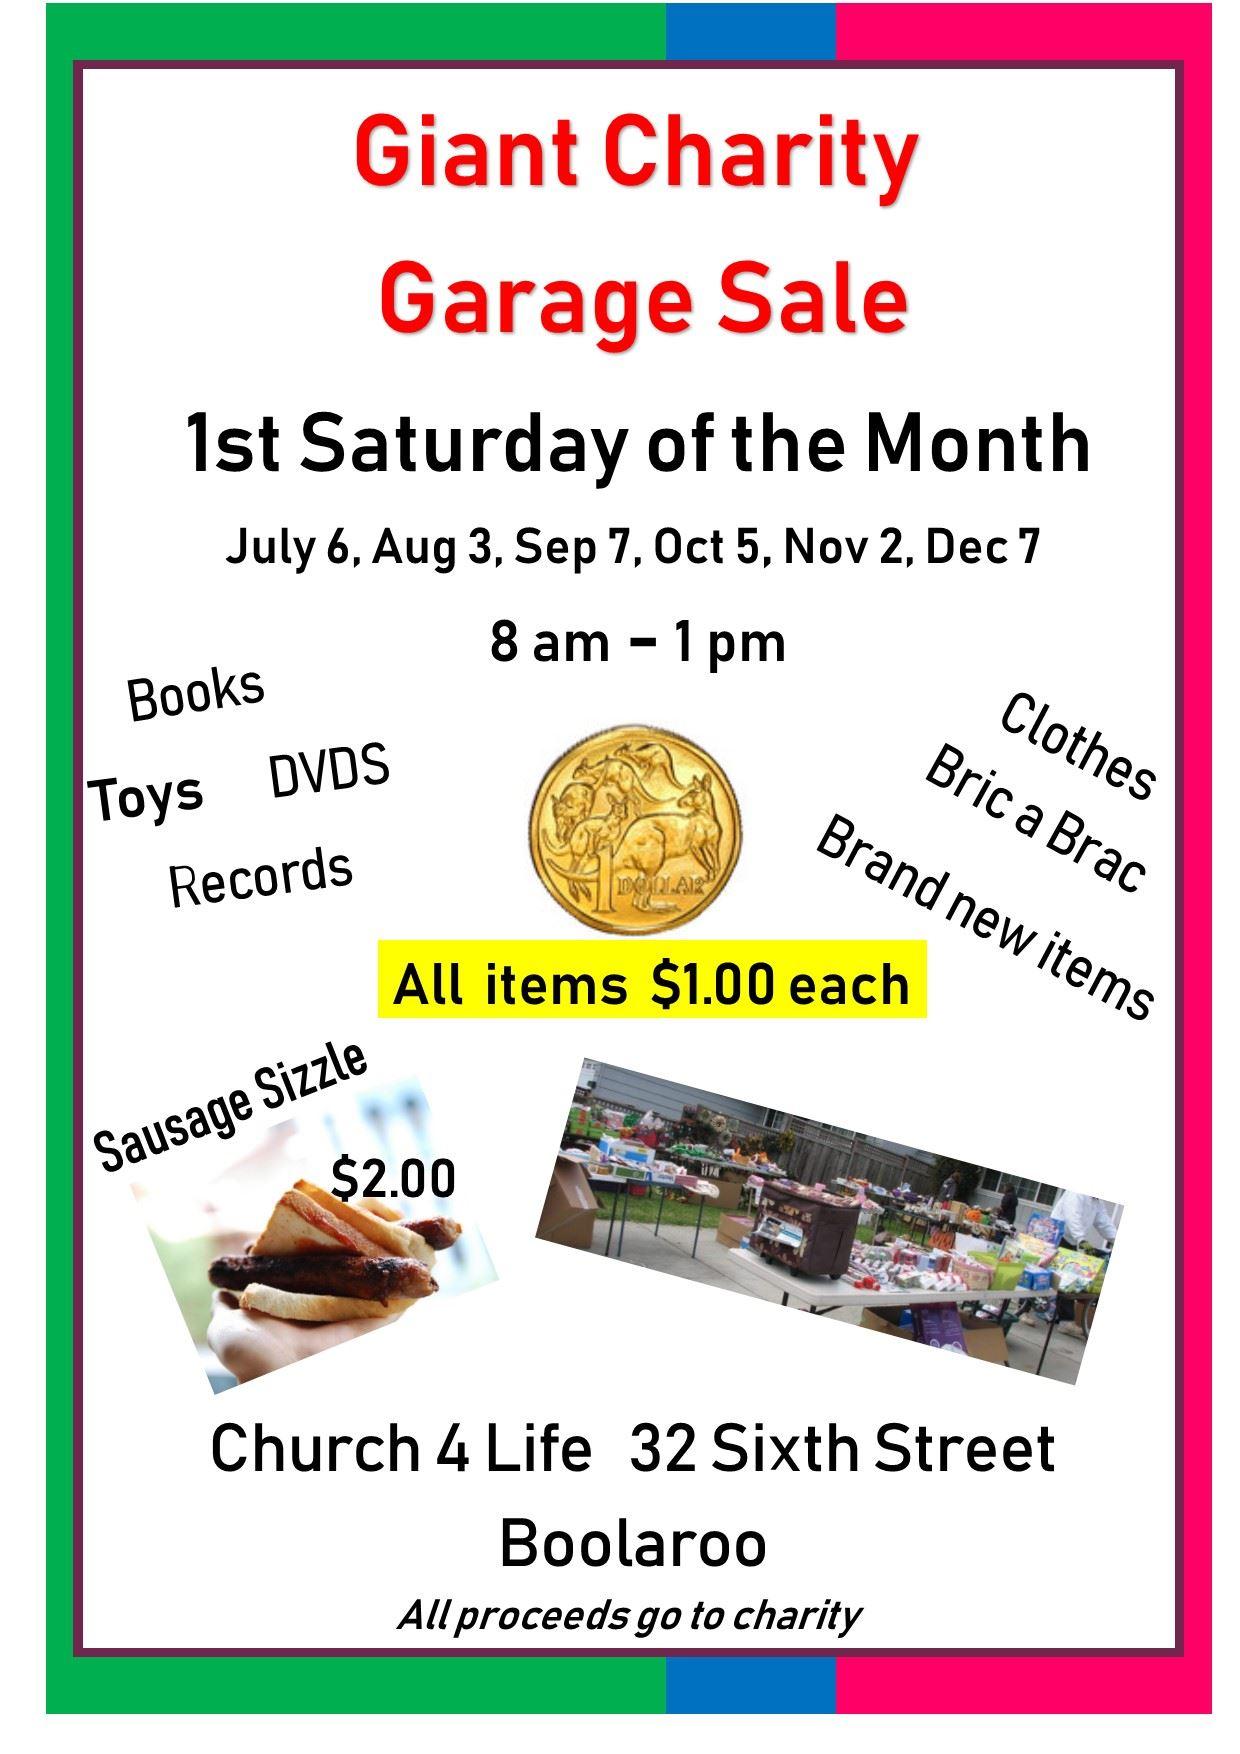 9fdb19fea96 Giant Charity Garage Sale - City of Newcastle